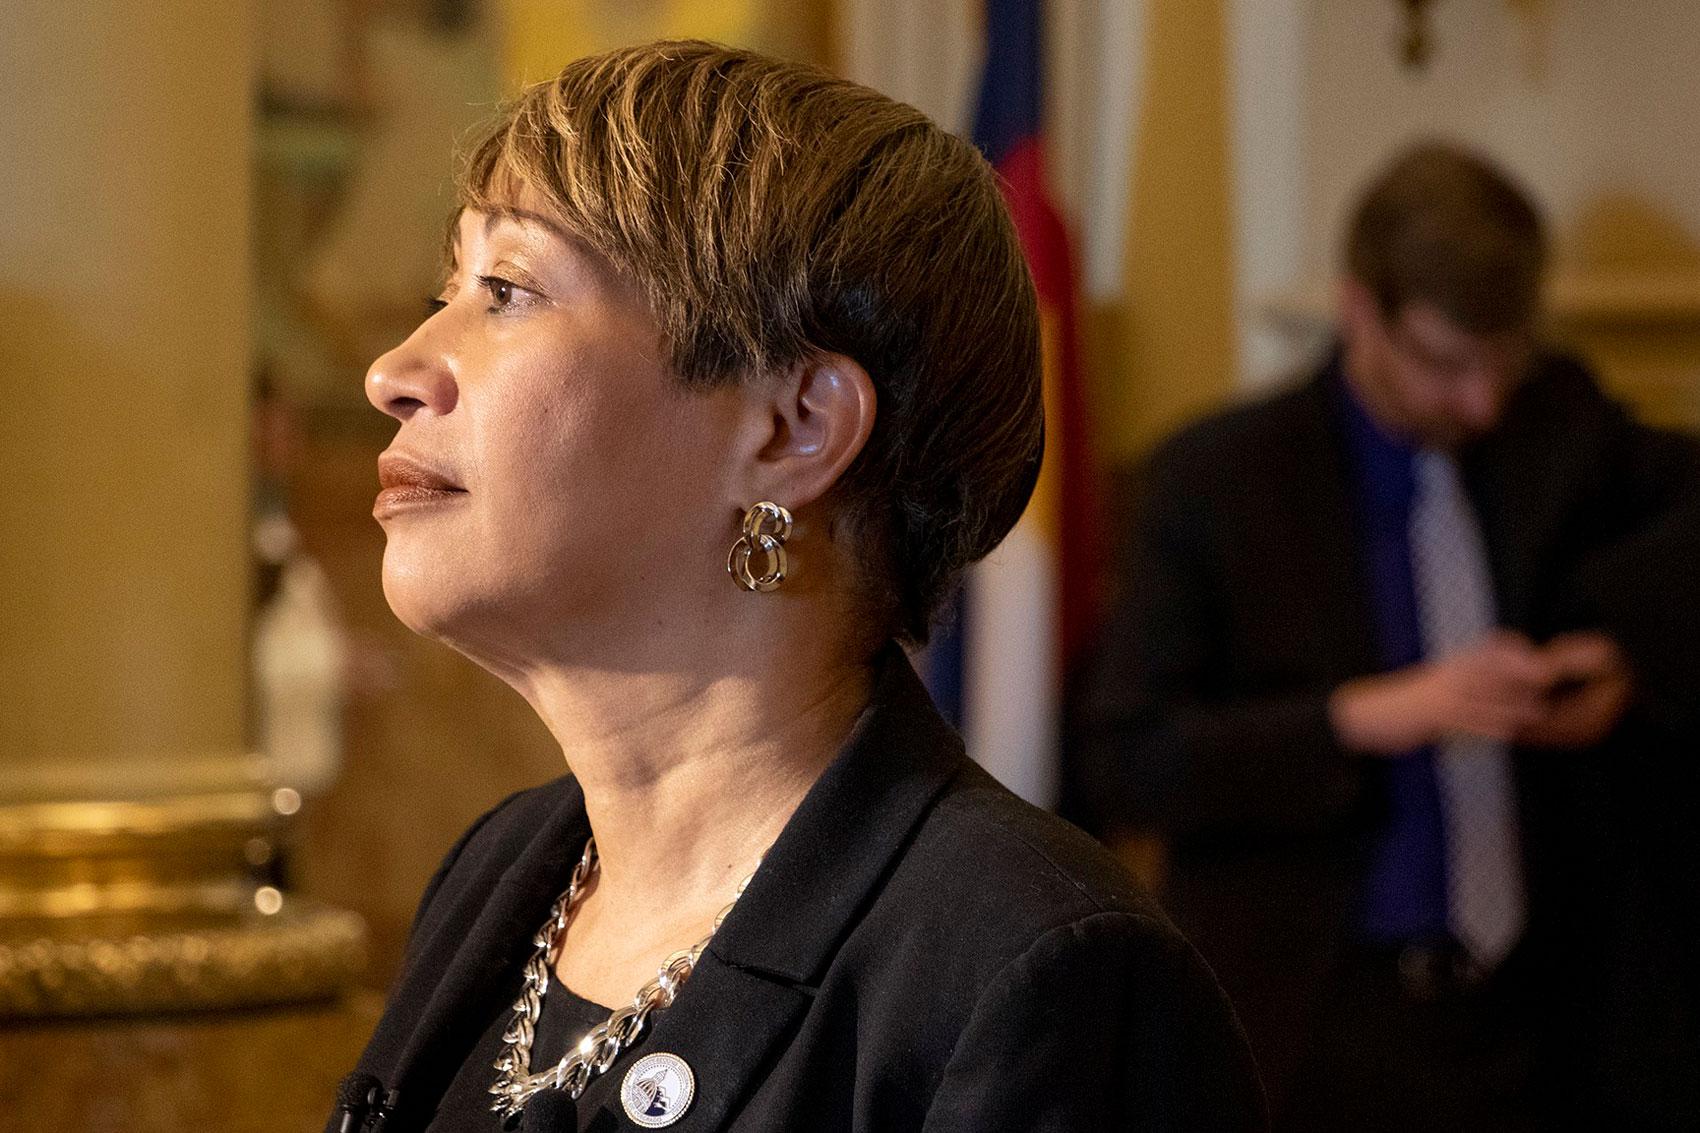 State Senator Angela Williams speaks with press inside the Capitol, March 5, 2019. (Kevin J. Beaty/Denverite)